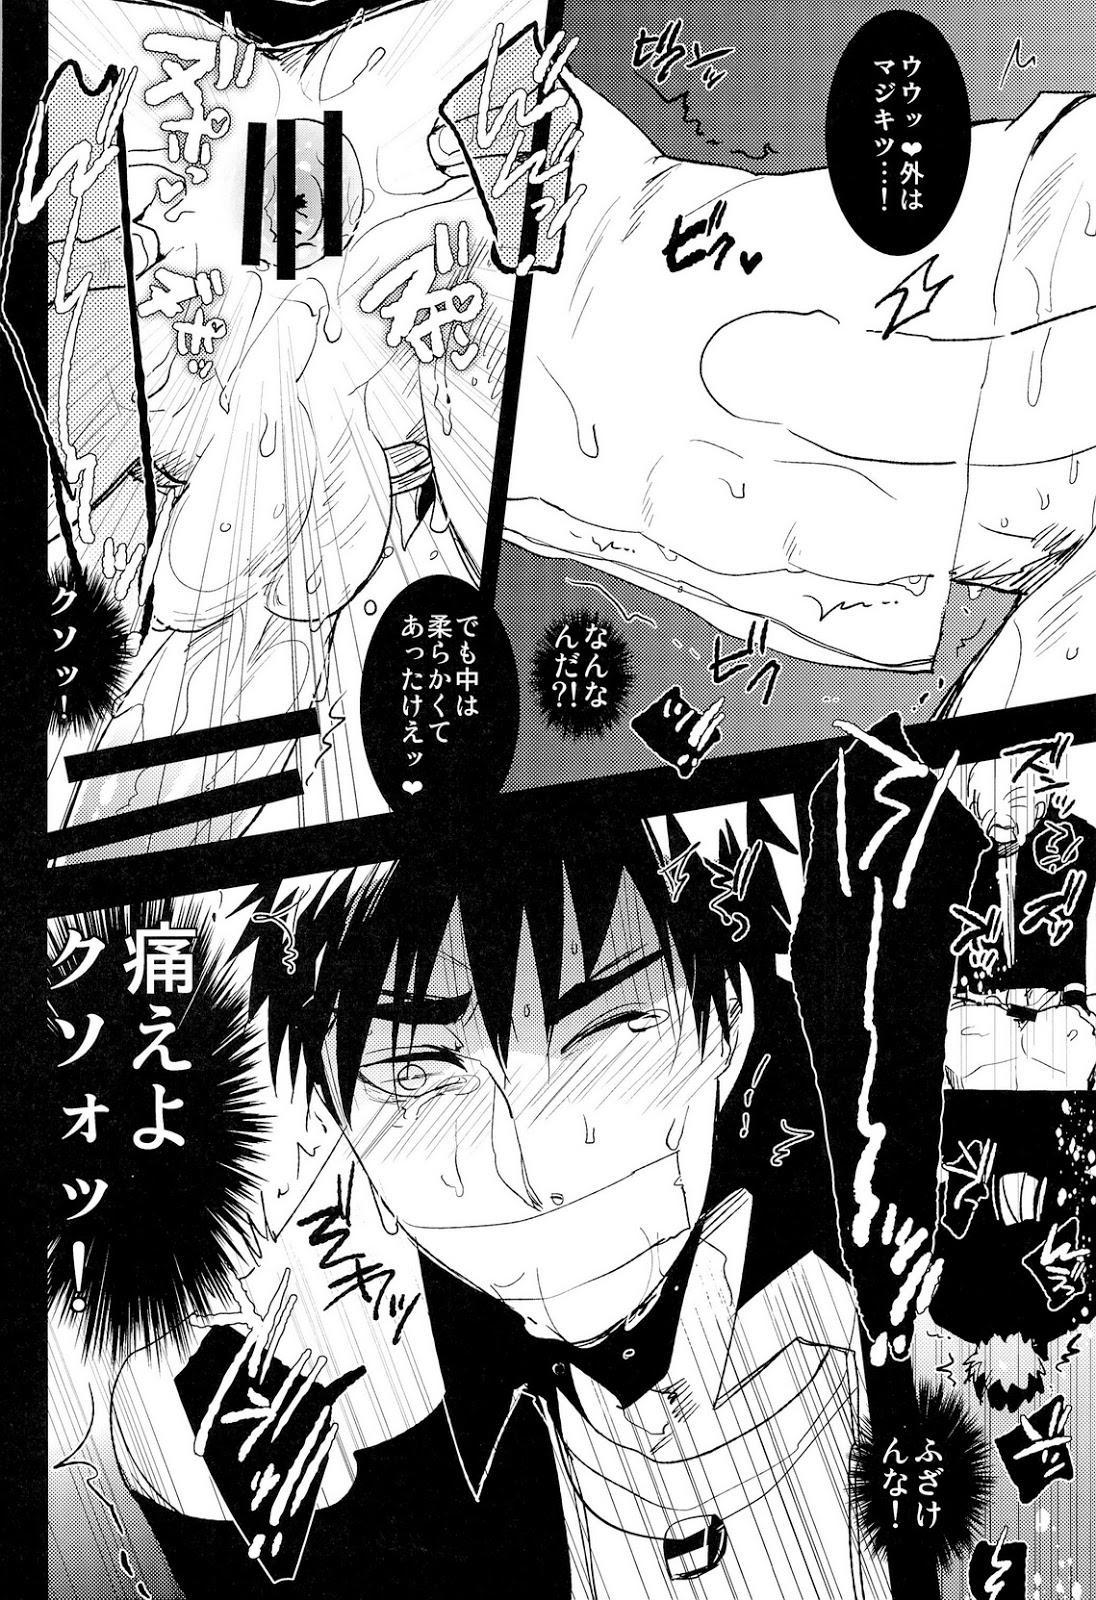 Kabejiri Hon - DK Fuck 11